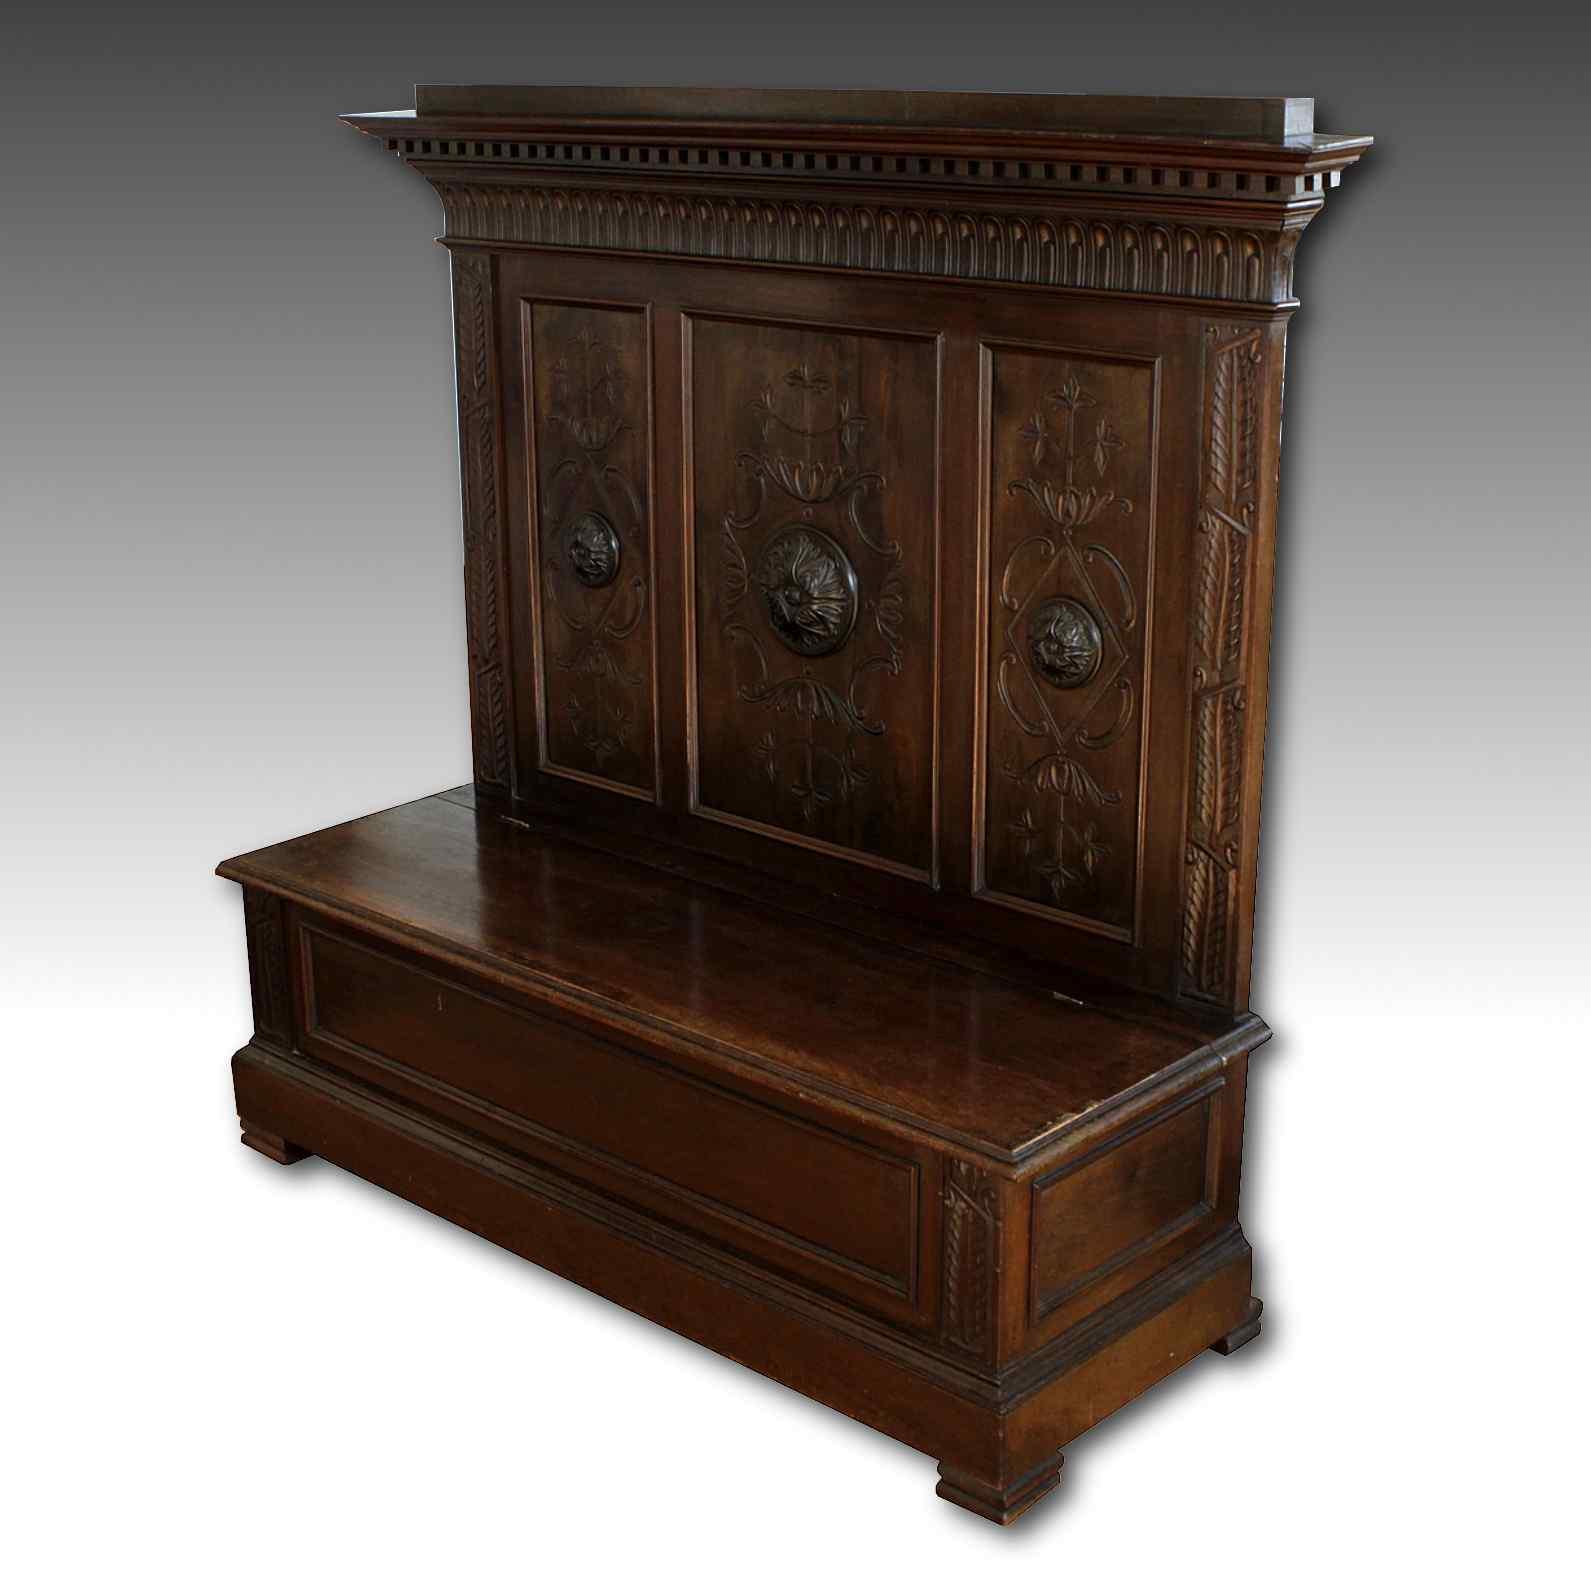 banc avec coffre fashion designs. Black Bedroom Furniture Sets. Home Design Ideas